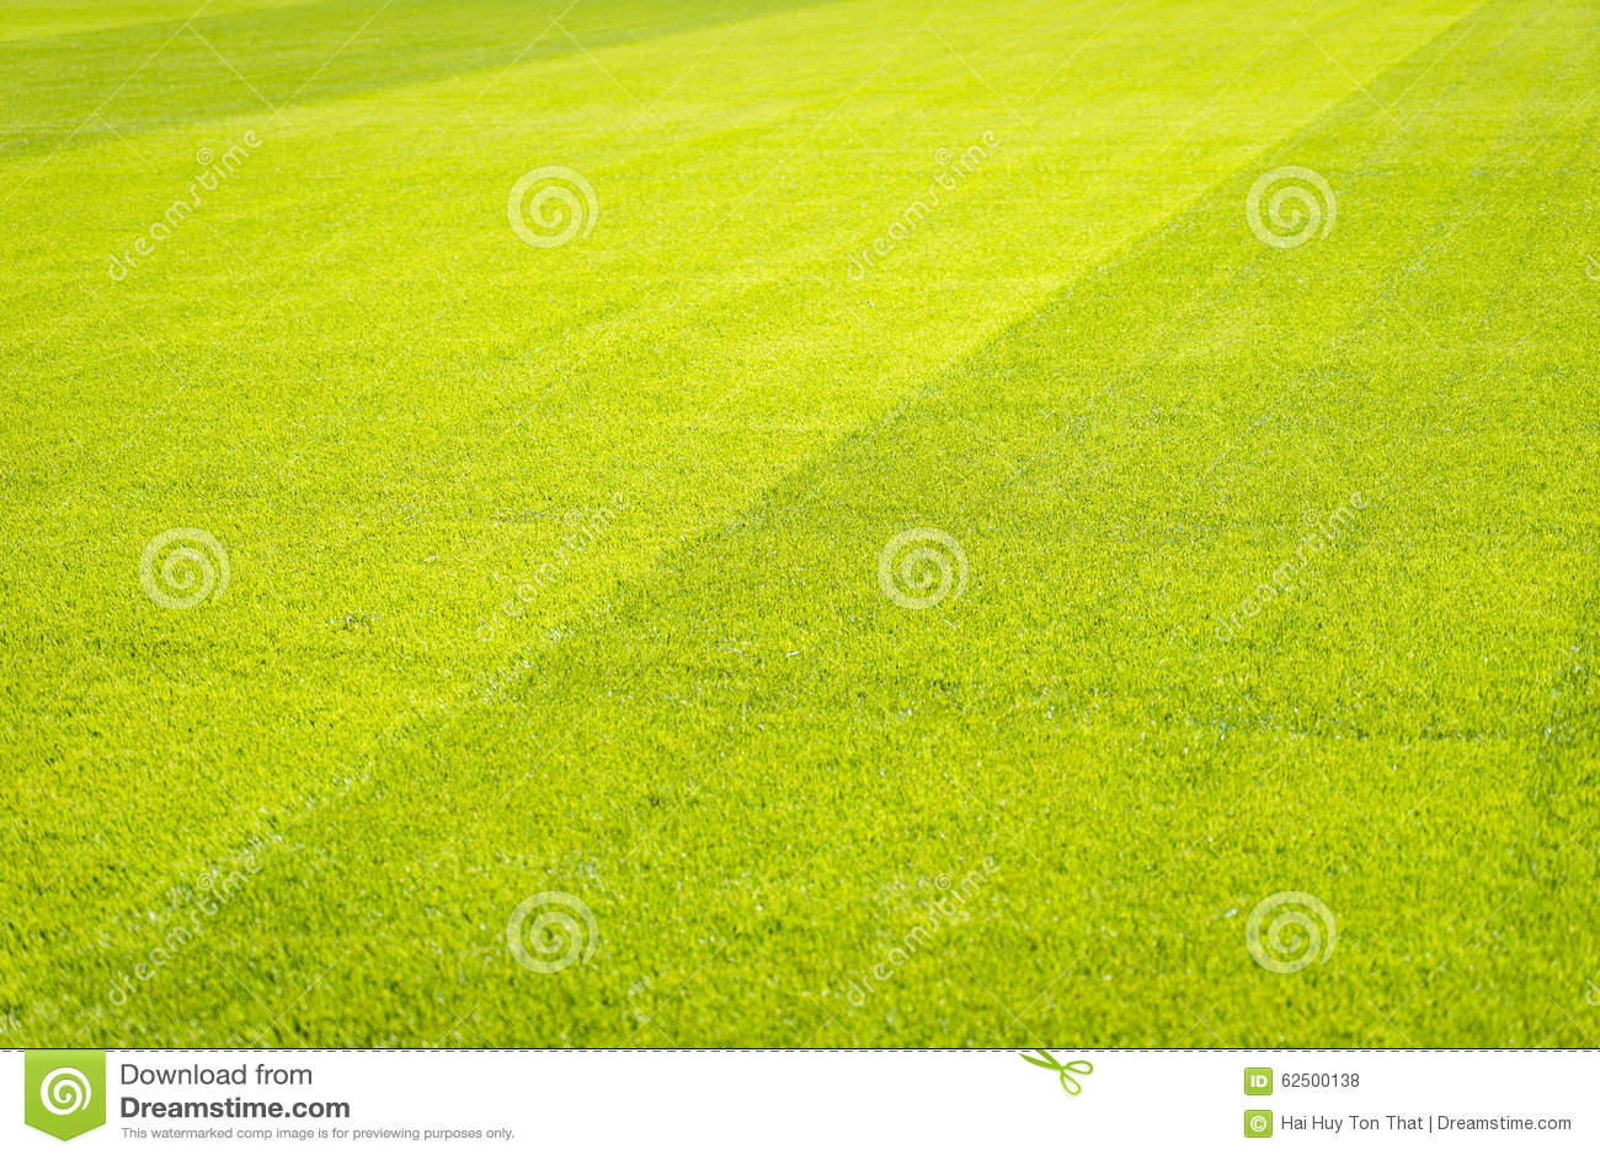 Seamless Vinyl Photography Backdrop Football Stadium Match: Football Field Background Stock Photo. Image Of Football